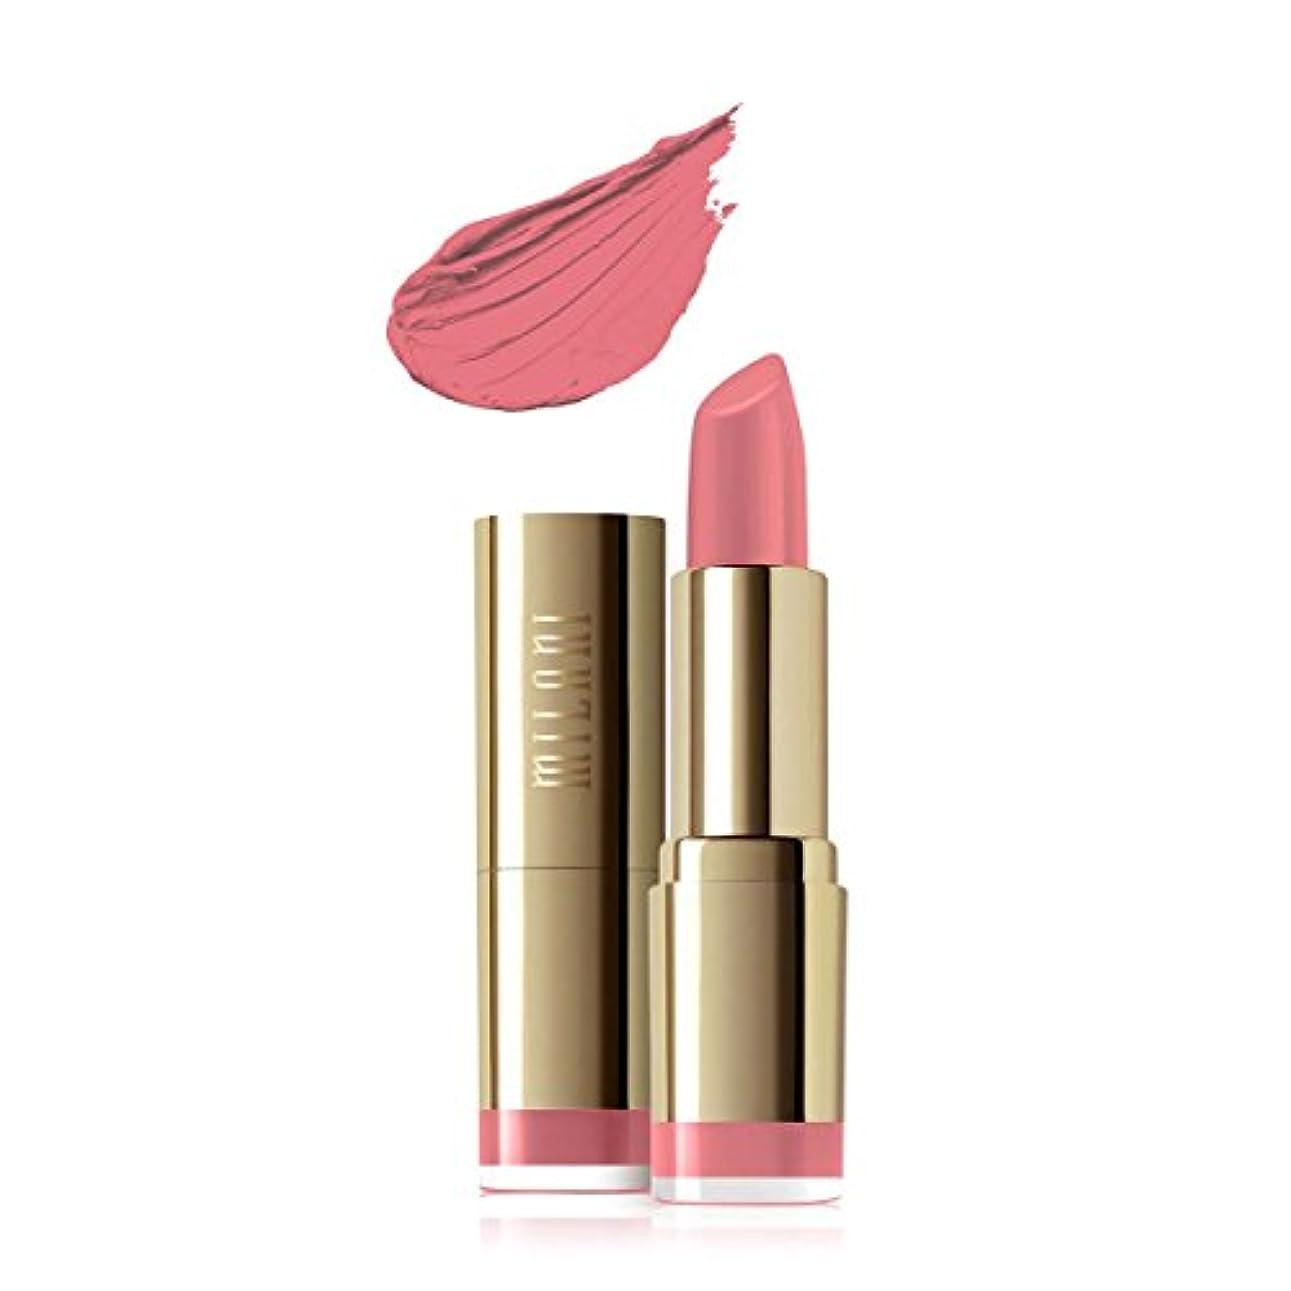 MILANI Color Statement Moisture Matte Lipstick - Matte Darling (並行輸入品)